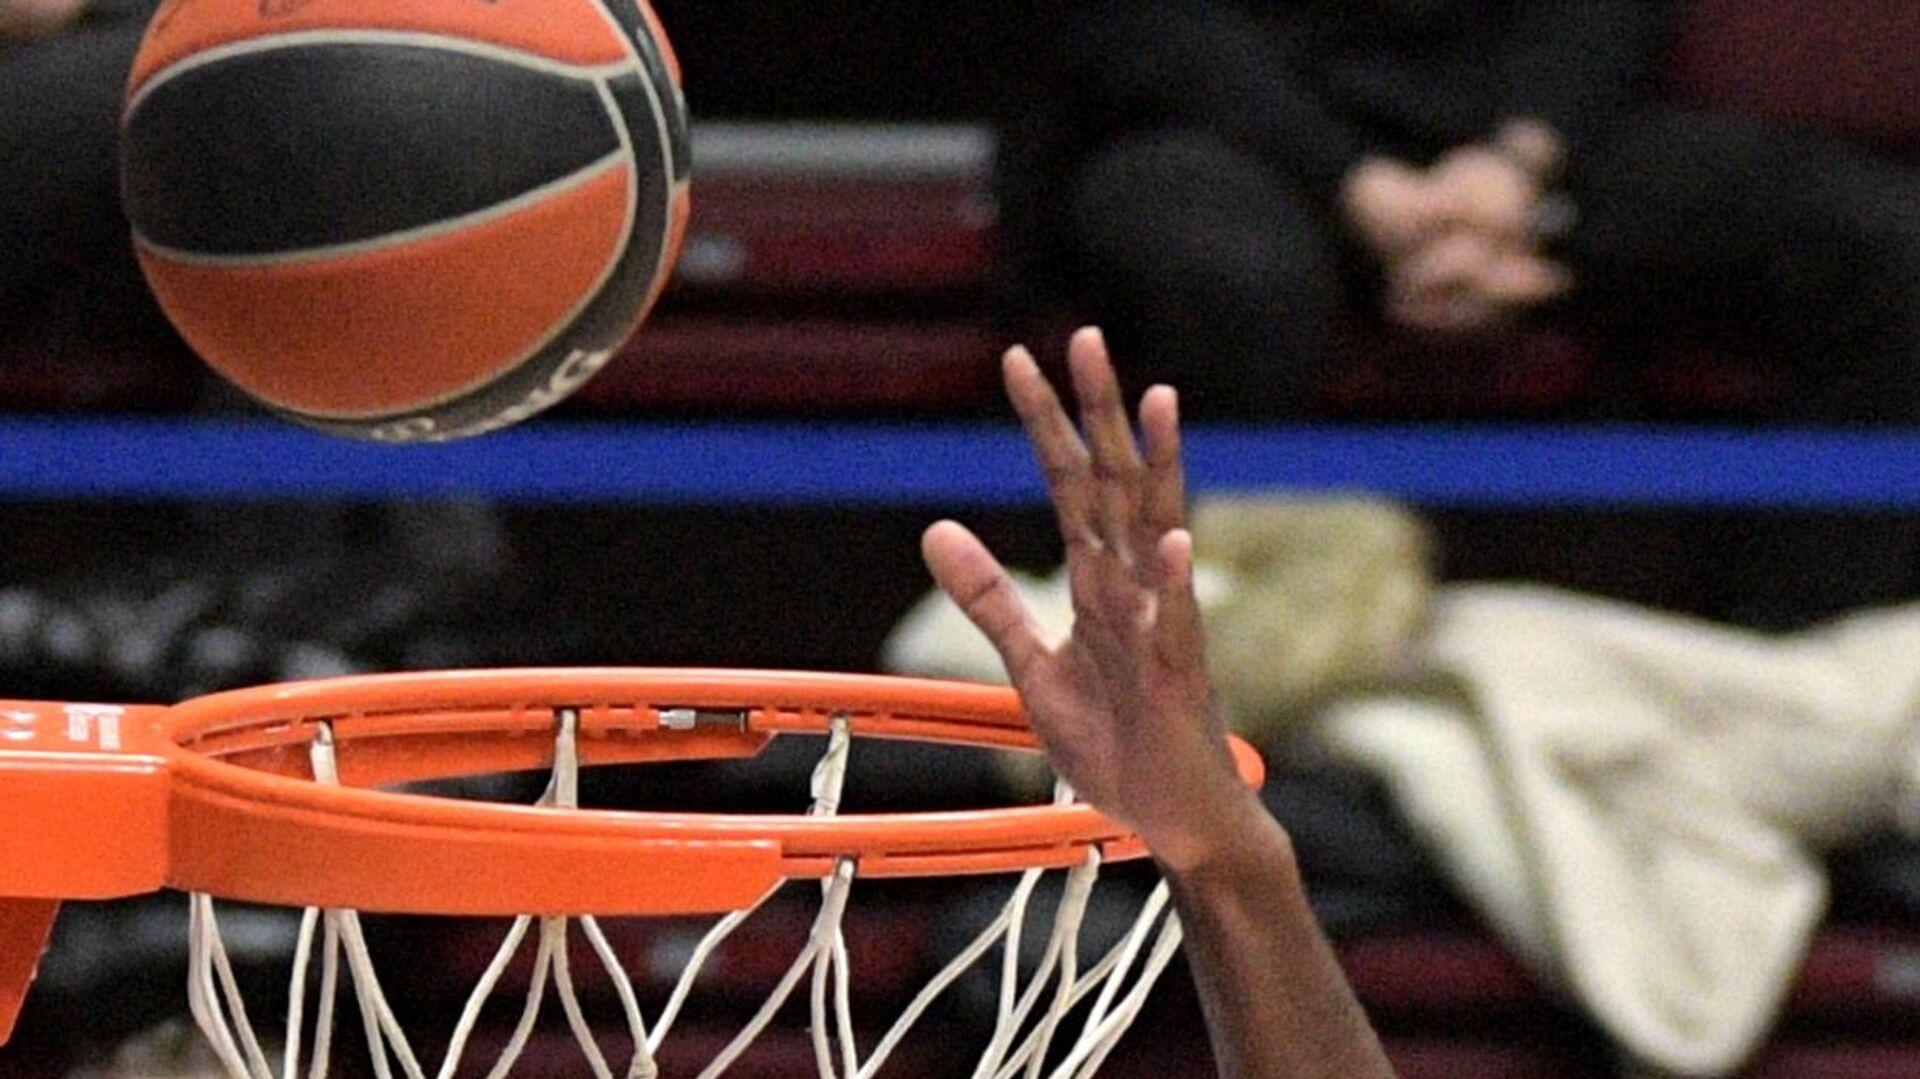 Basketball (Symbolbild) - SNA, 1920, 27.01.2021